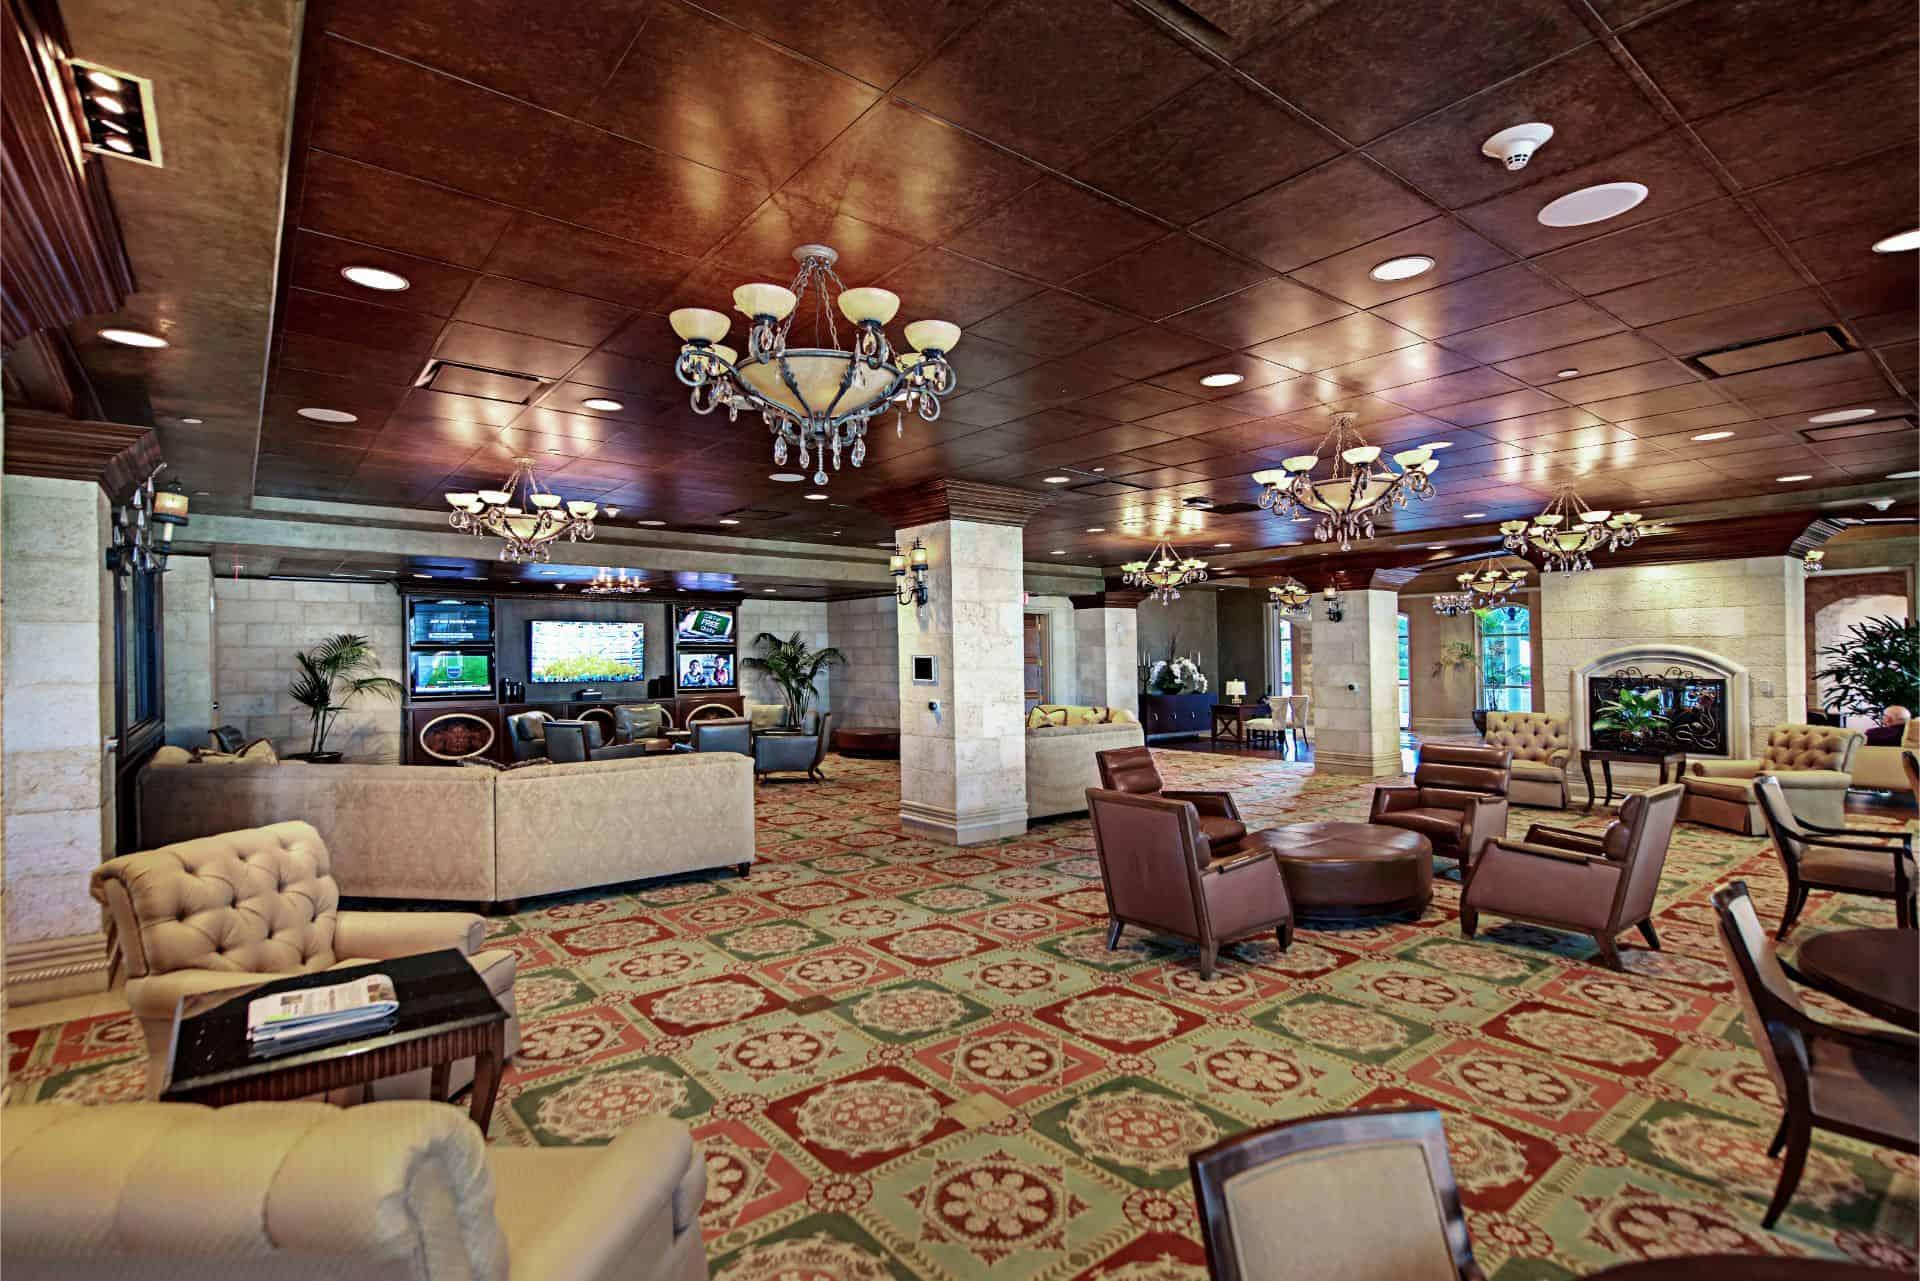 las-vegas-luxry-real-estate-realtor-rob-jensen-company-9101-alta-drive-unit-1207-queensridge208